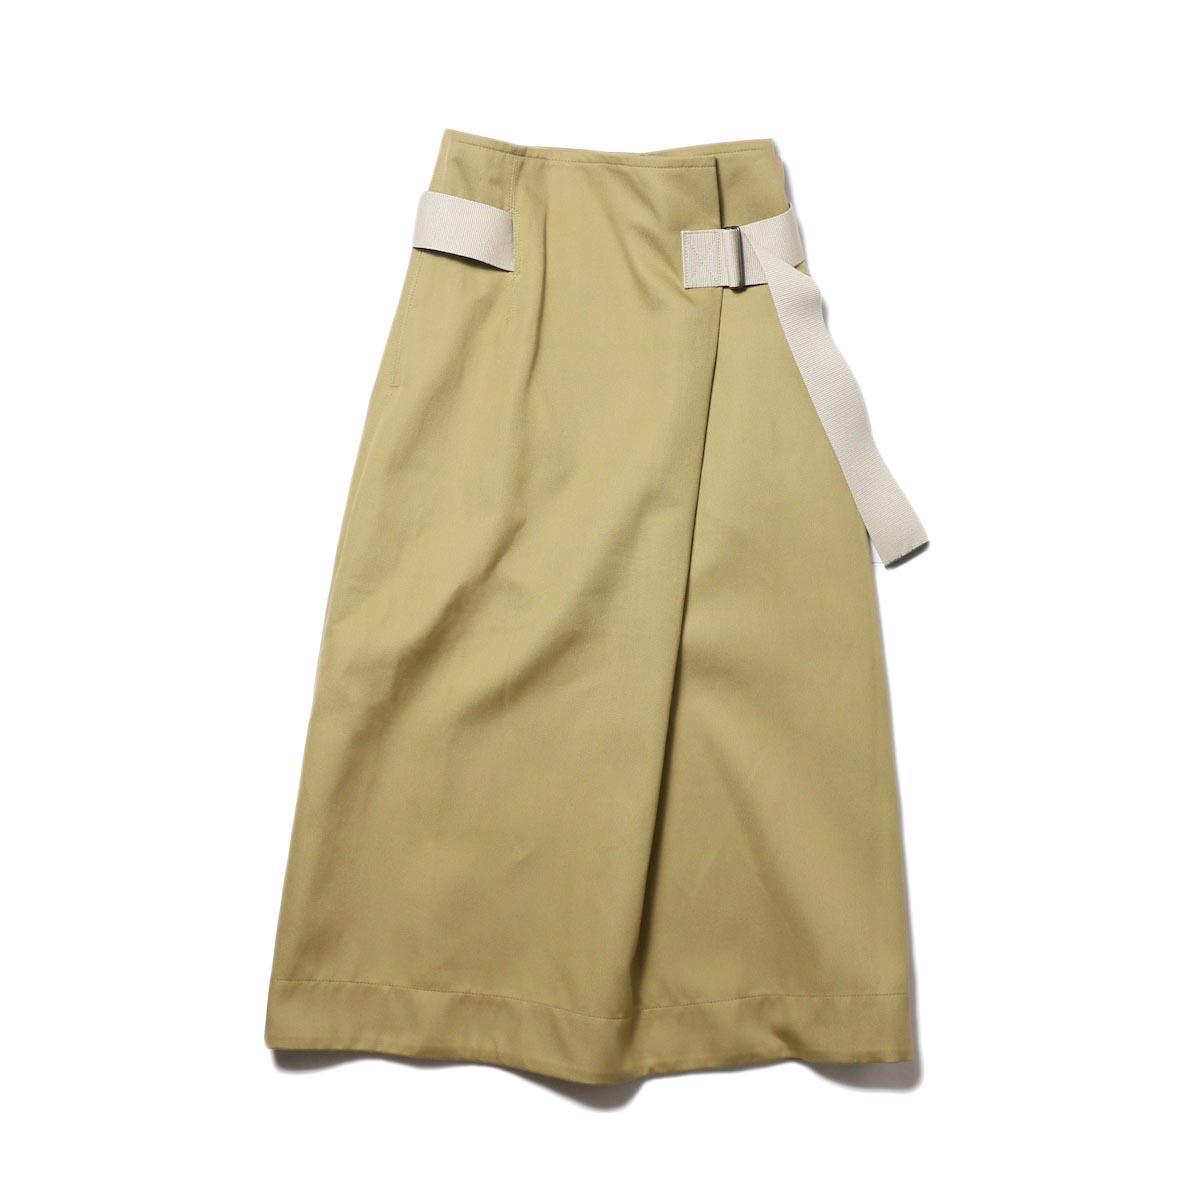 YLEVE / ELS COTTON DOUBLE CLOTH SKIRT (khaki)